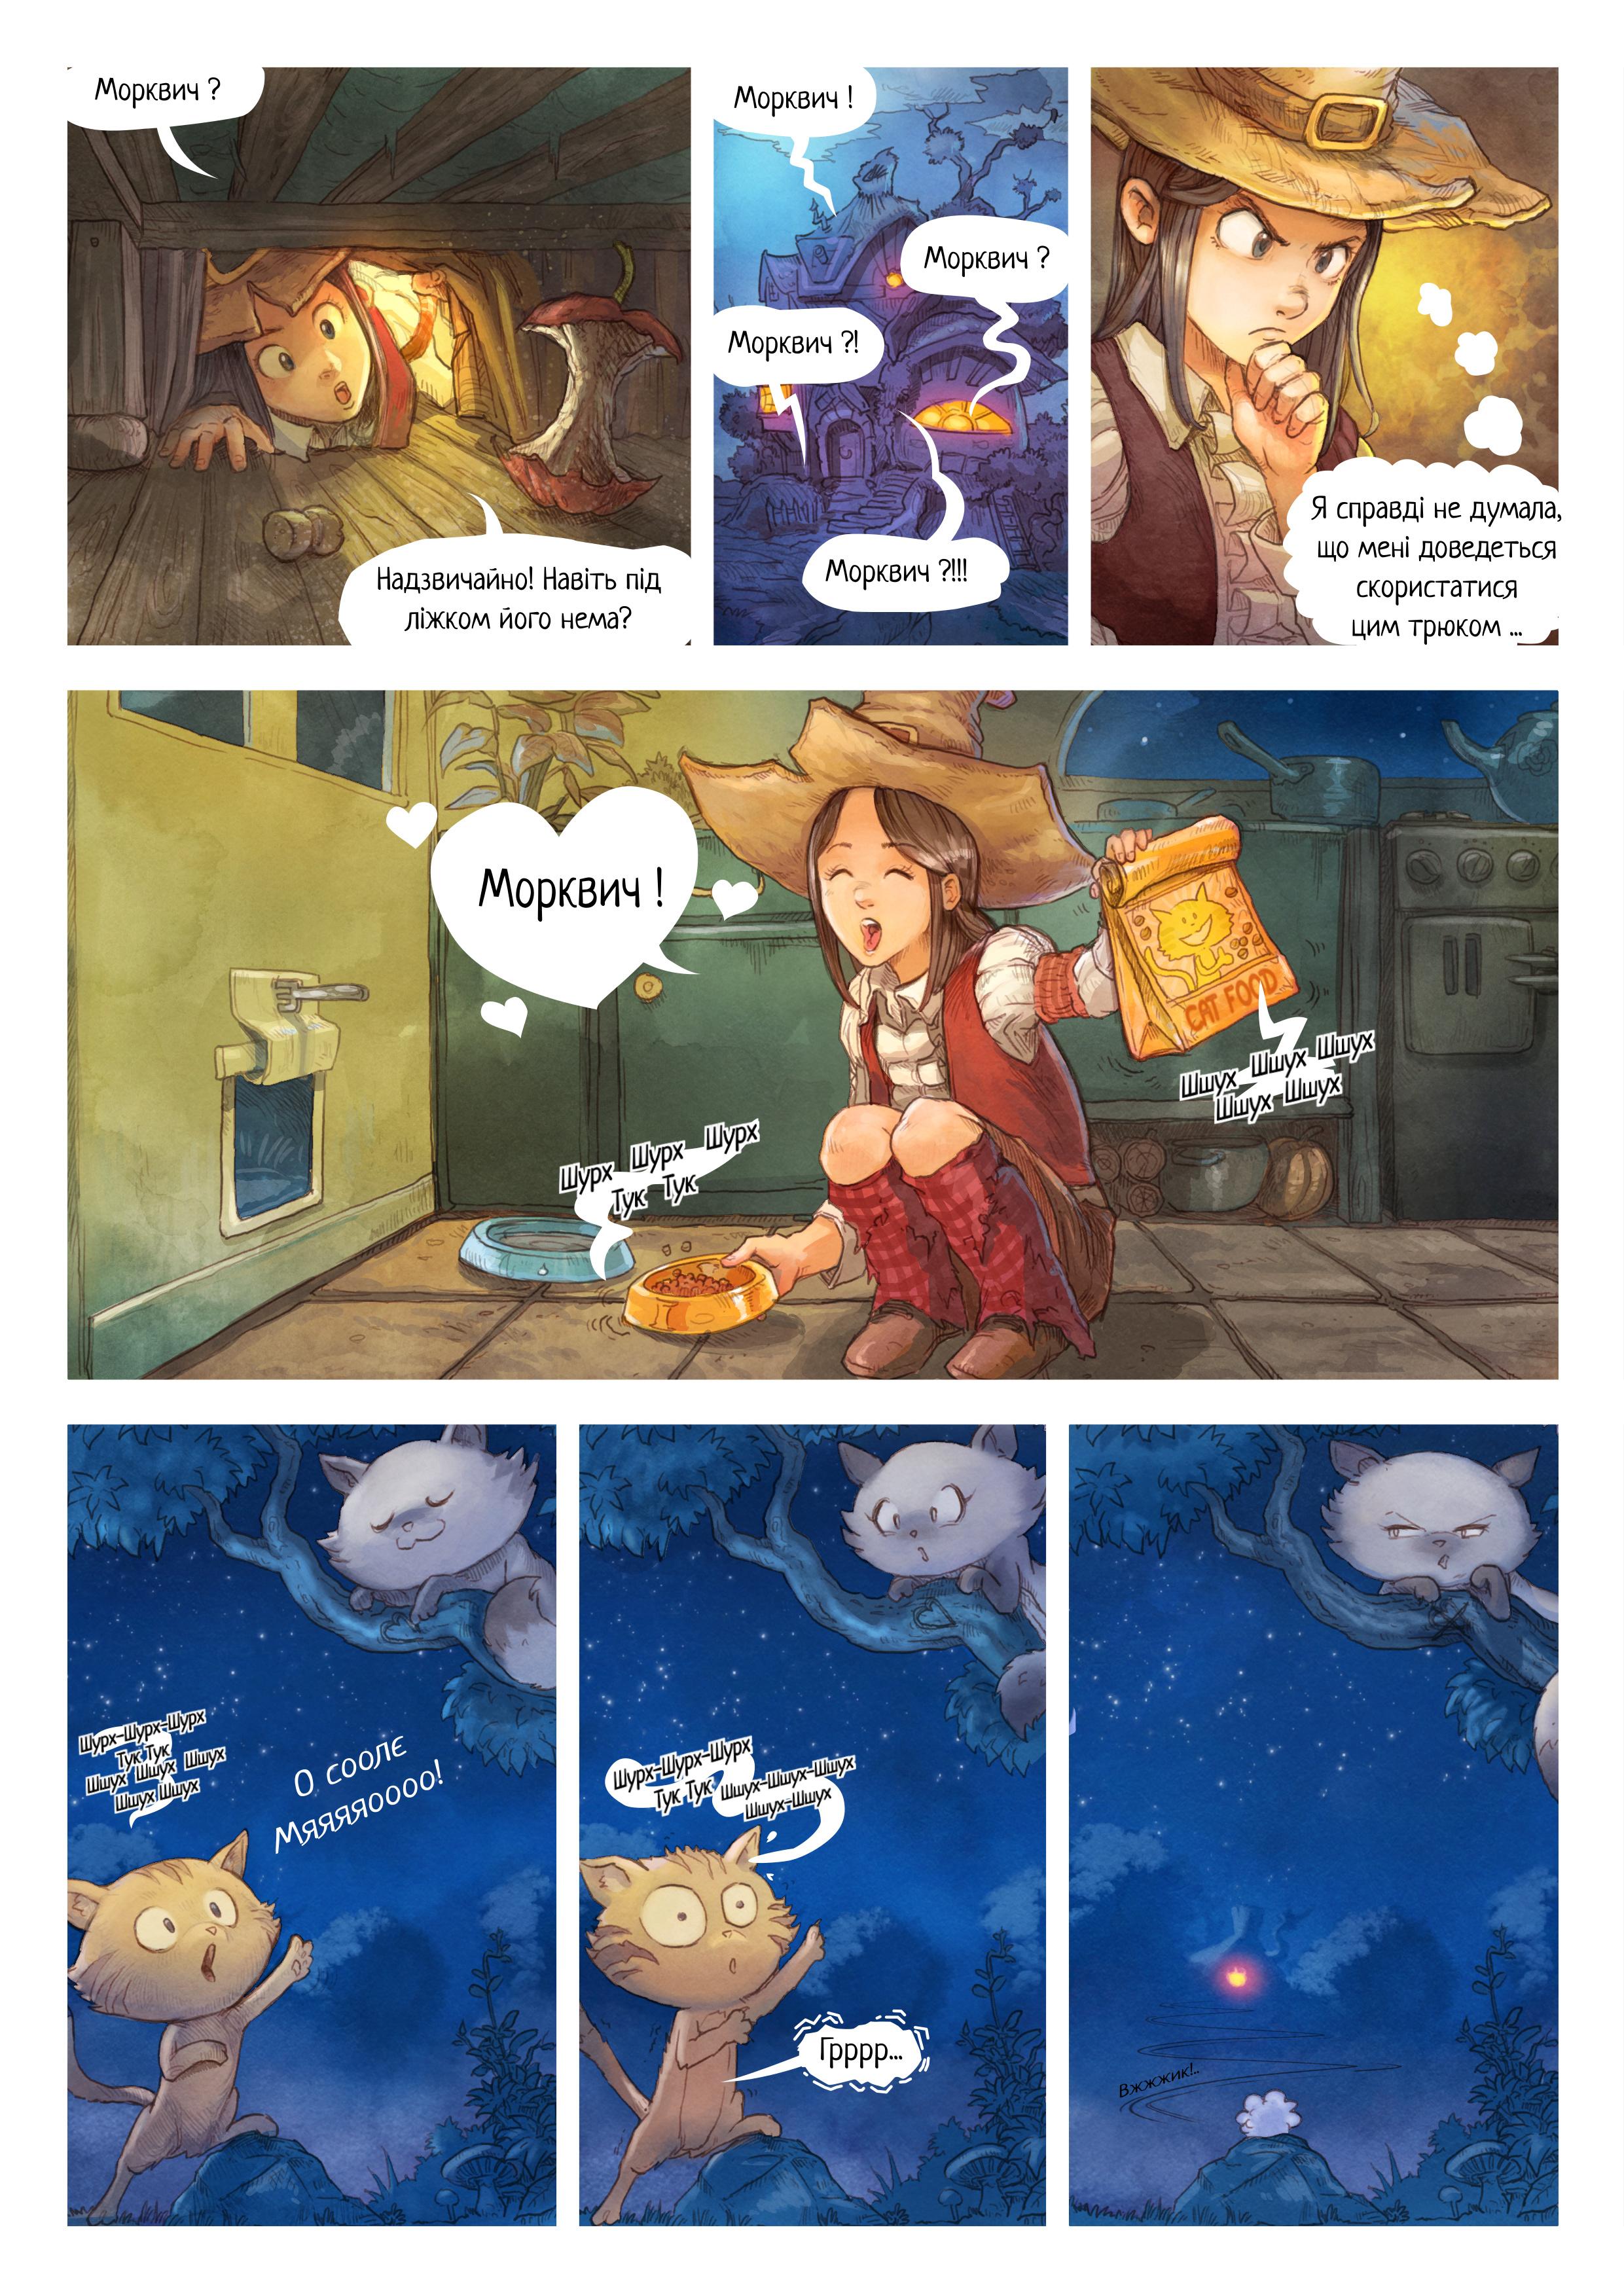 A webcomic page of Pepper&Carrot, епізод 4 [uk], стор. 2